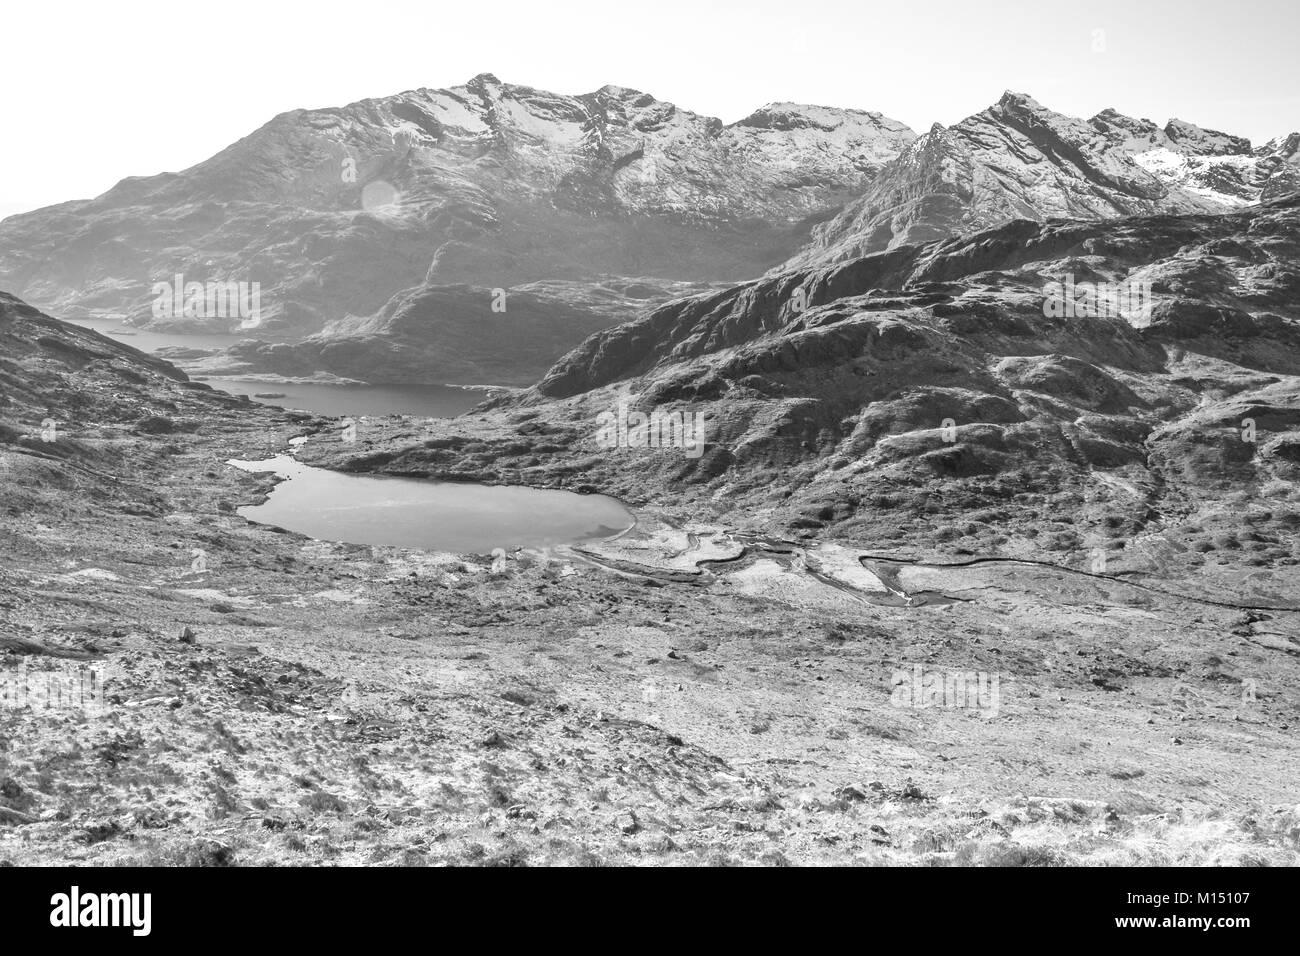 Loch Coruisk - Stock Image